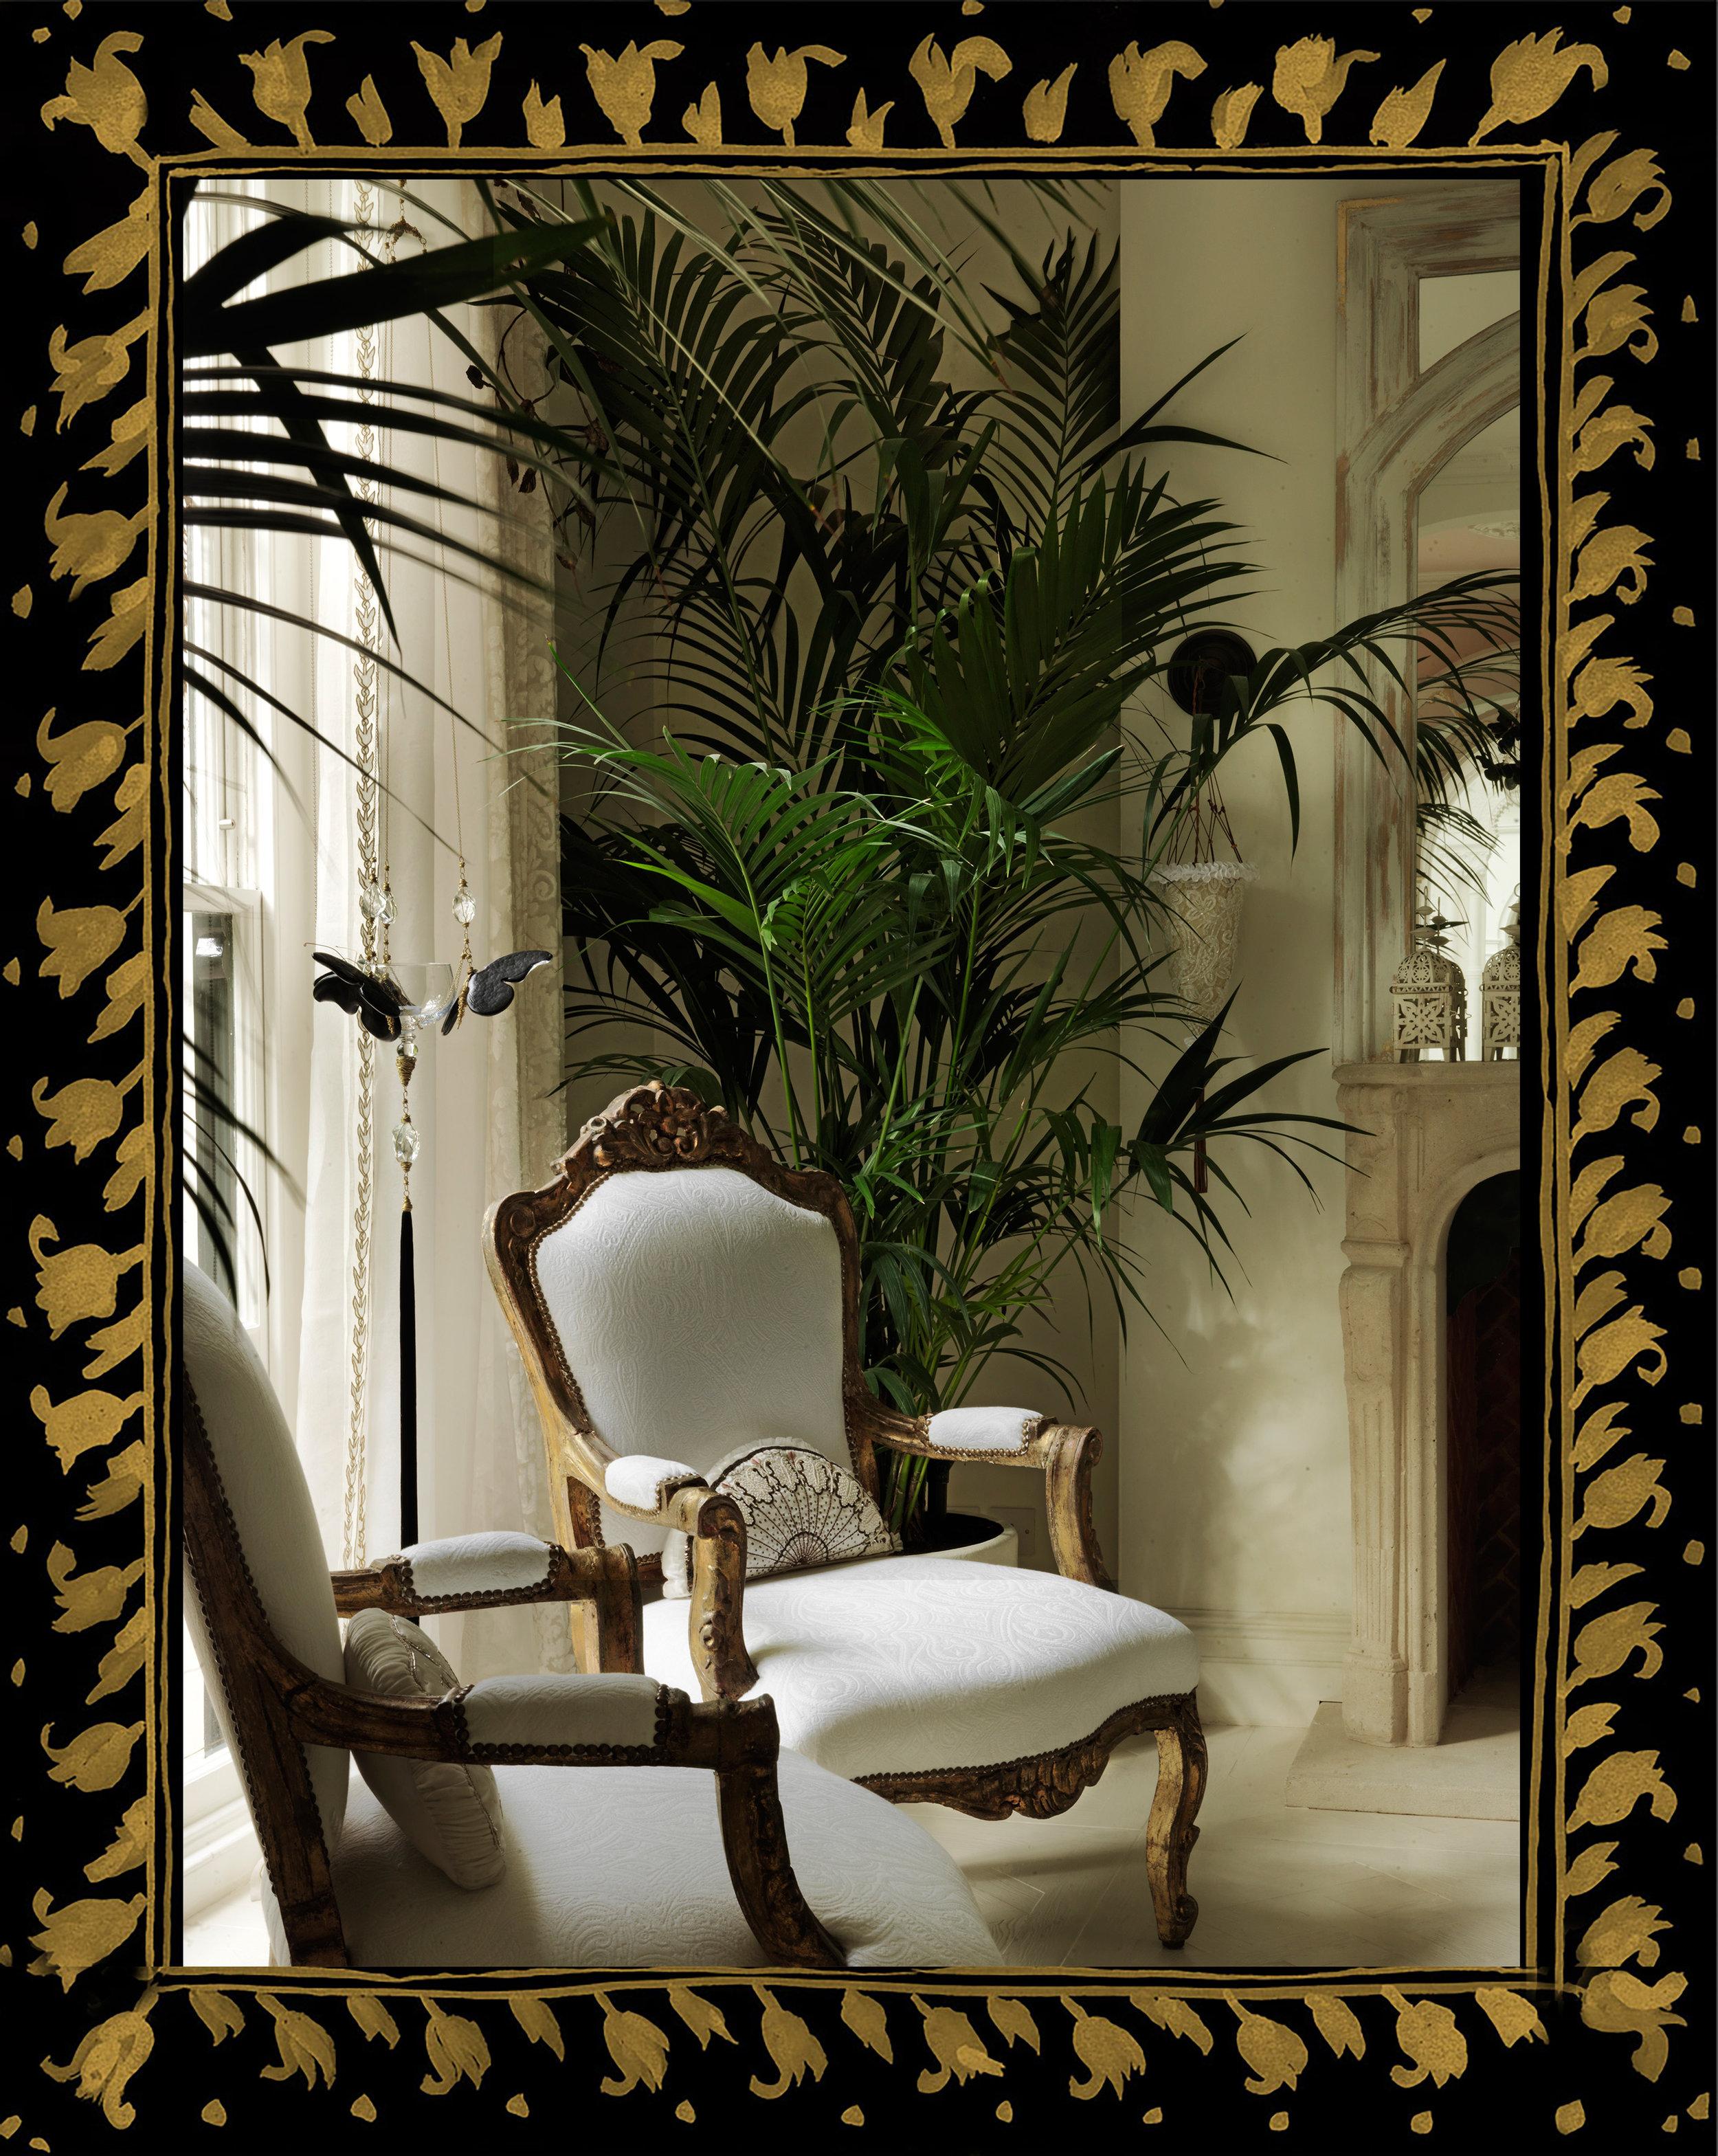 salon aac_k4564d67bf63_1000008.jpg